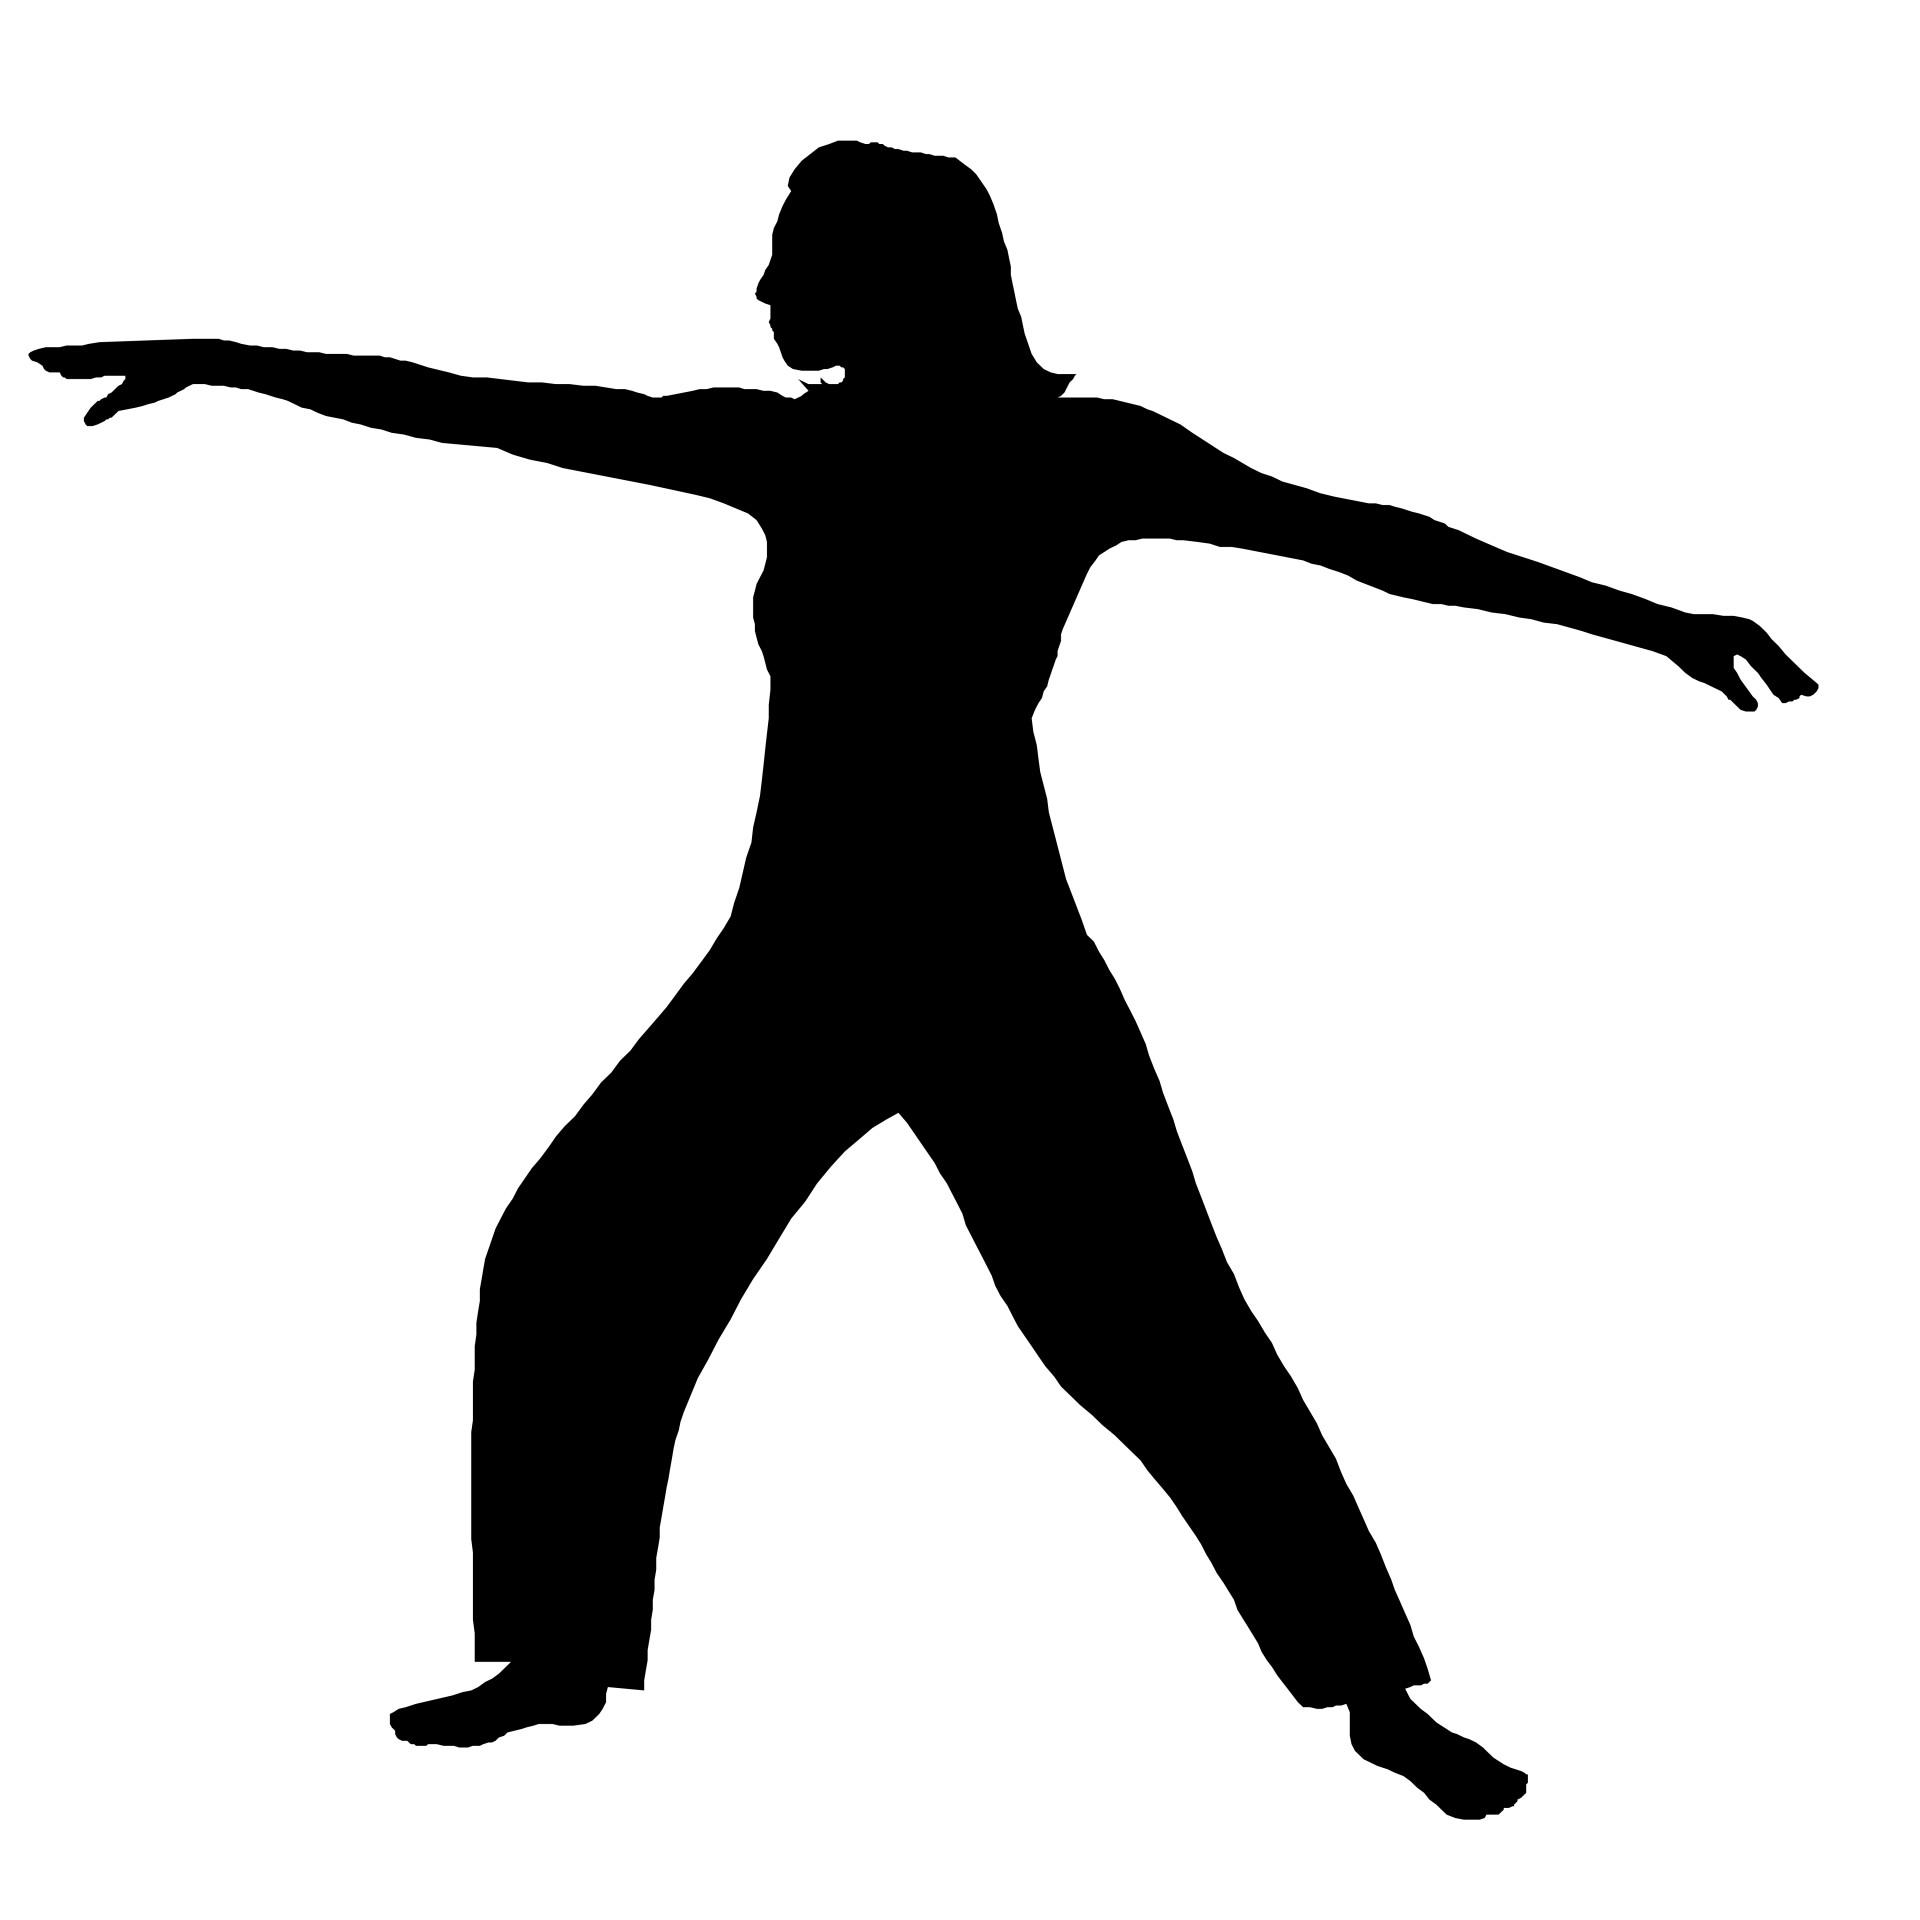 1920x1920 Fitness Silhouette Free Stock Photo